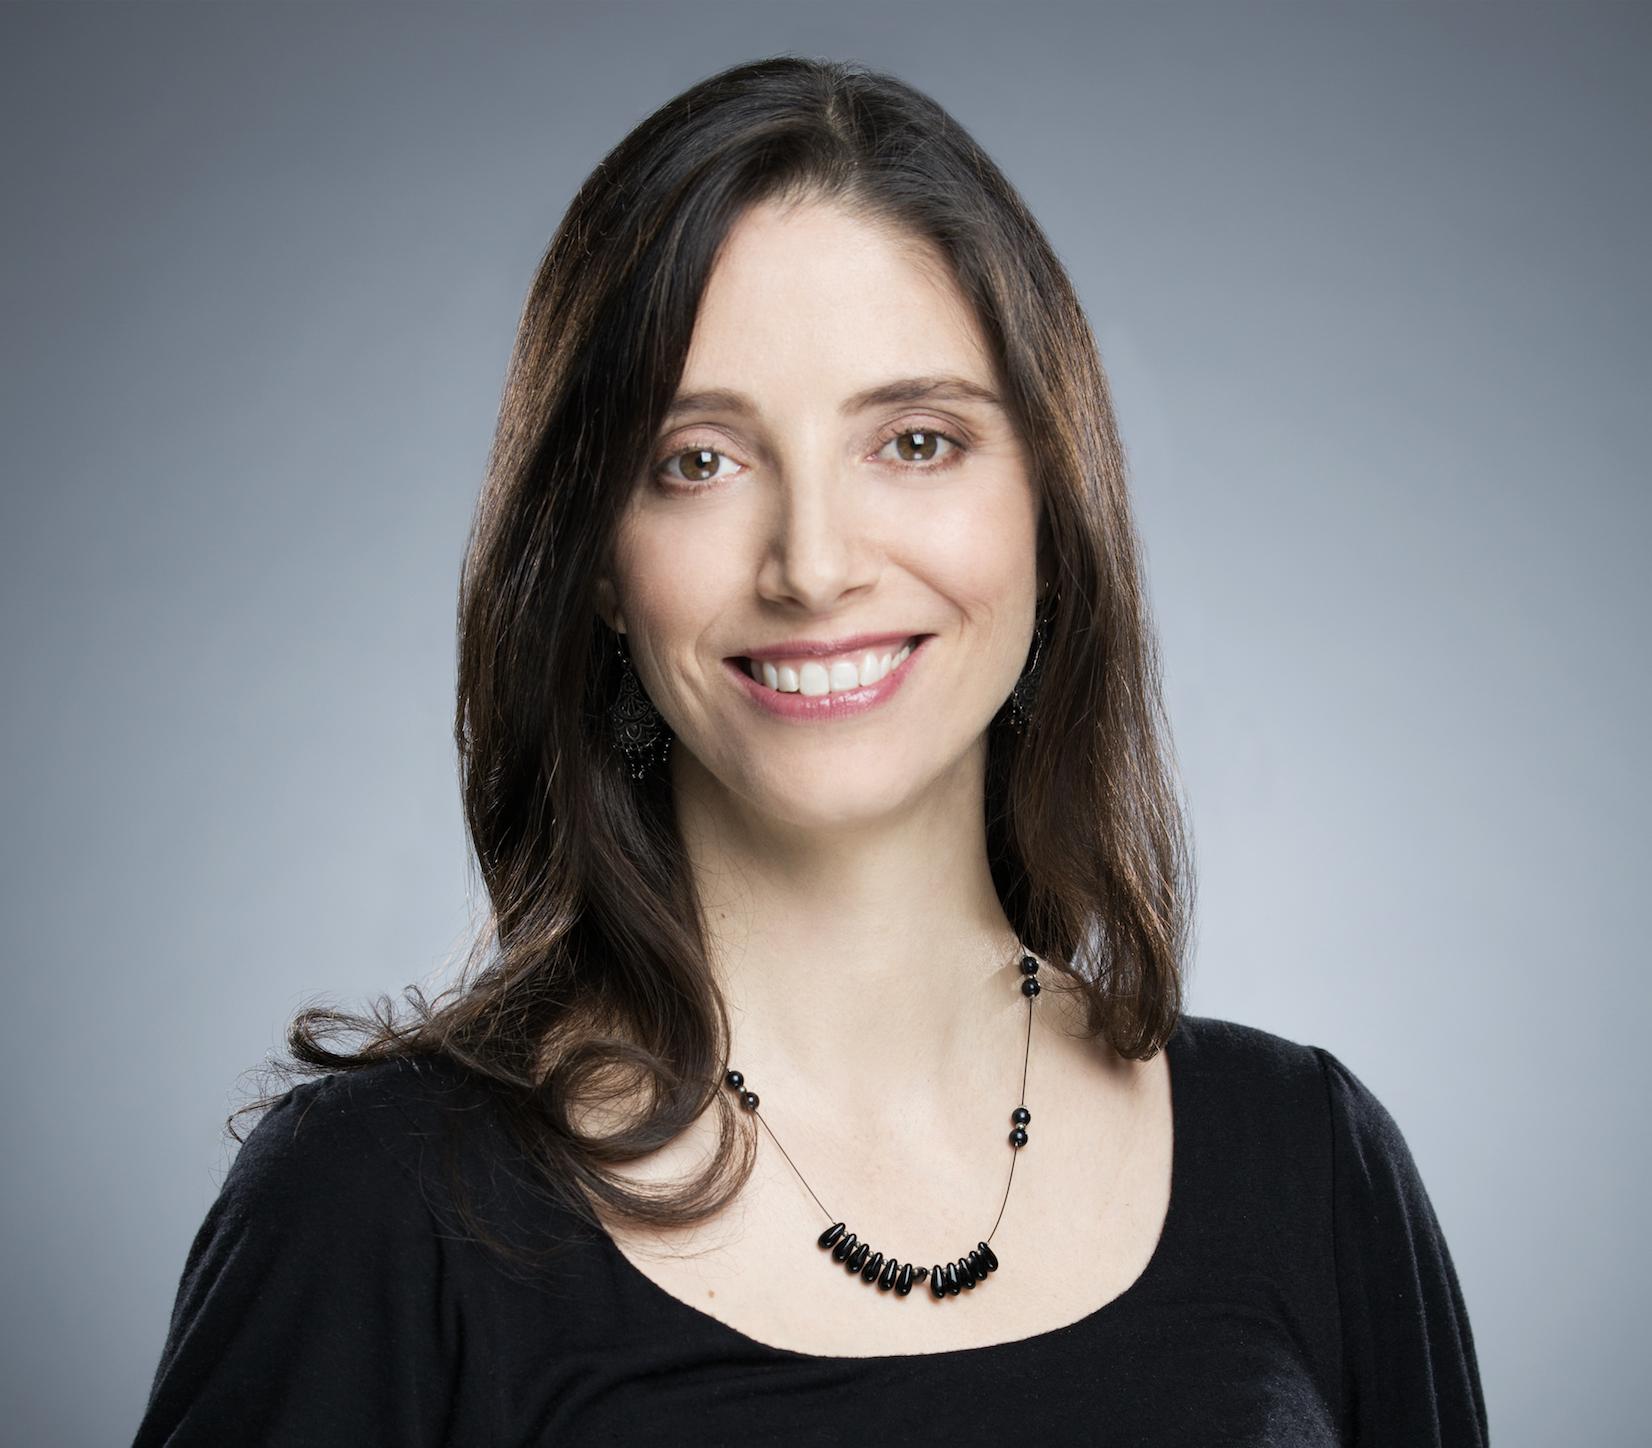 Anabeli Fernandez, Marketing Manager